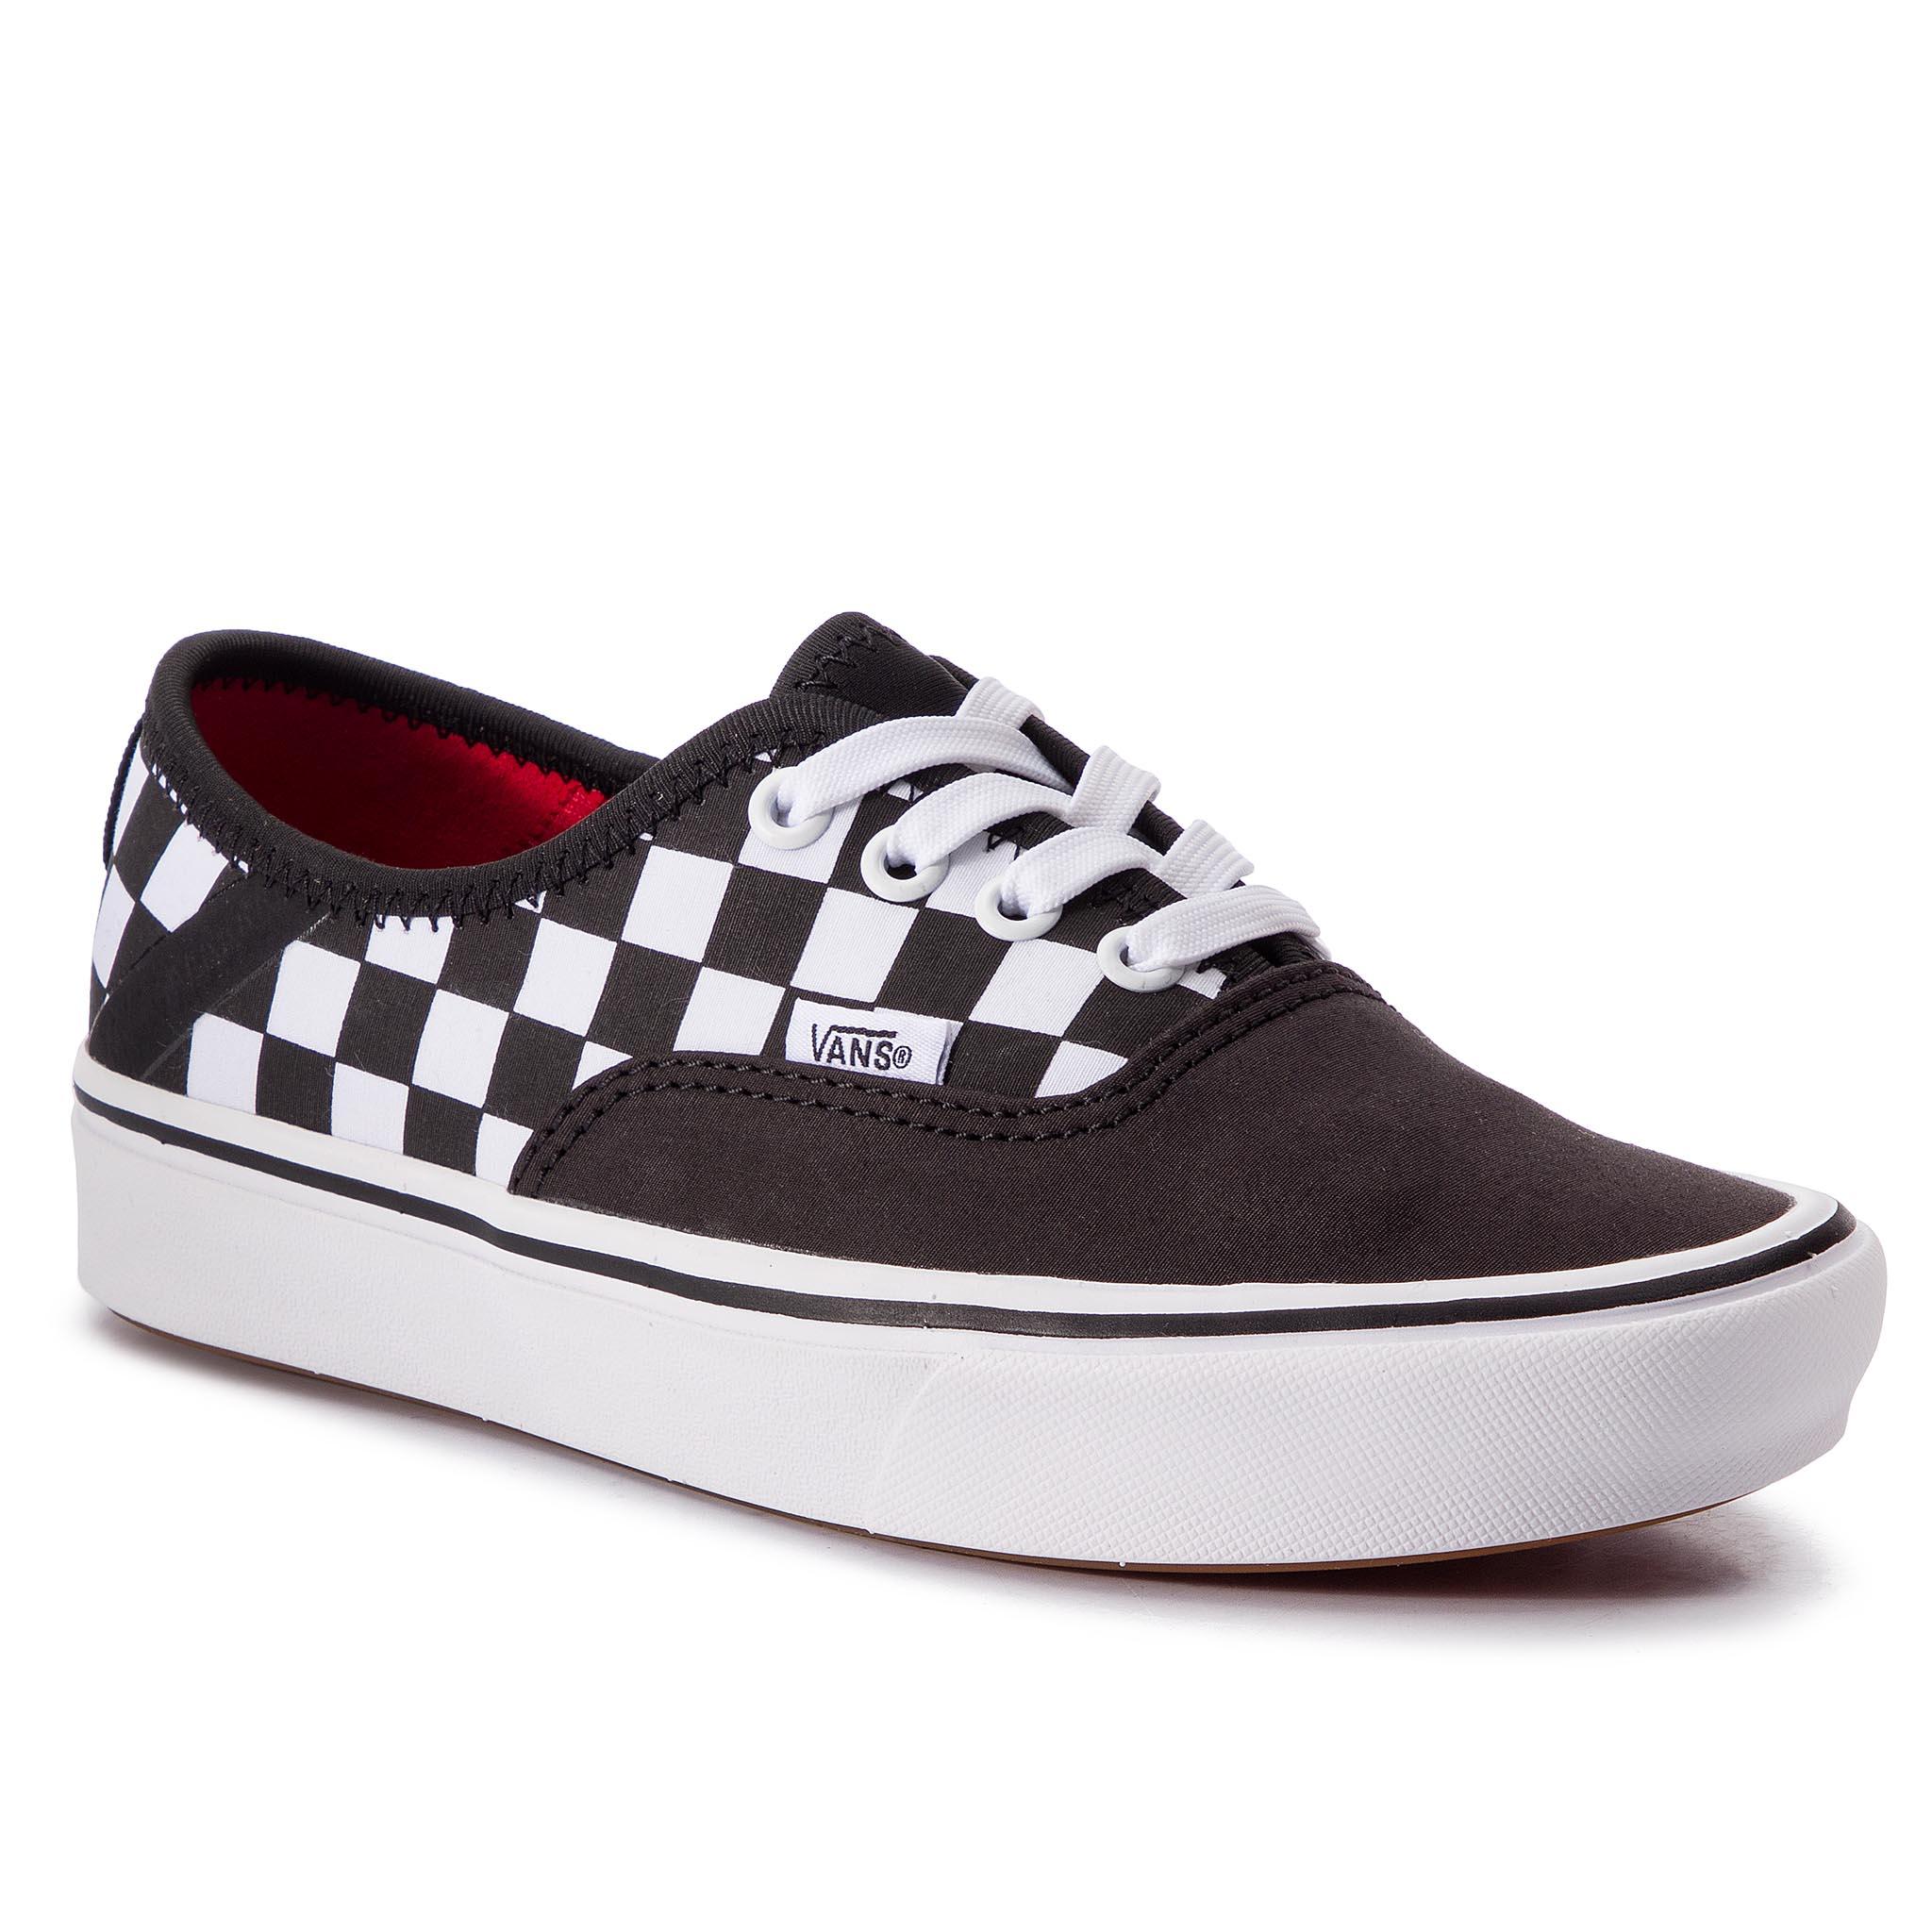 42f7980c941 Πάνινα παπούτσια VANS - Comfycush Authe VN0A3WM8VN81 (2 Tone)  Black/Checkerboa